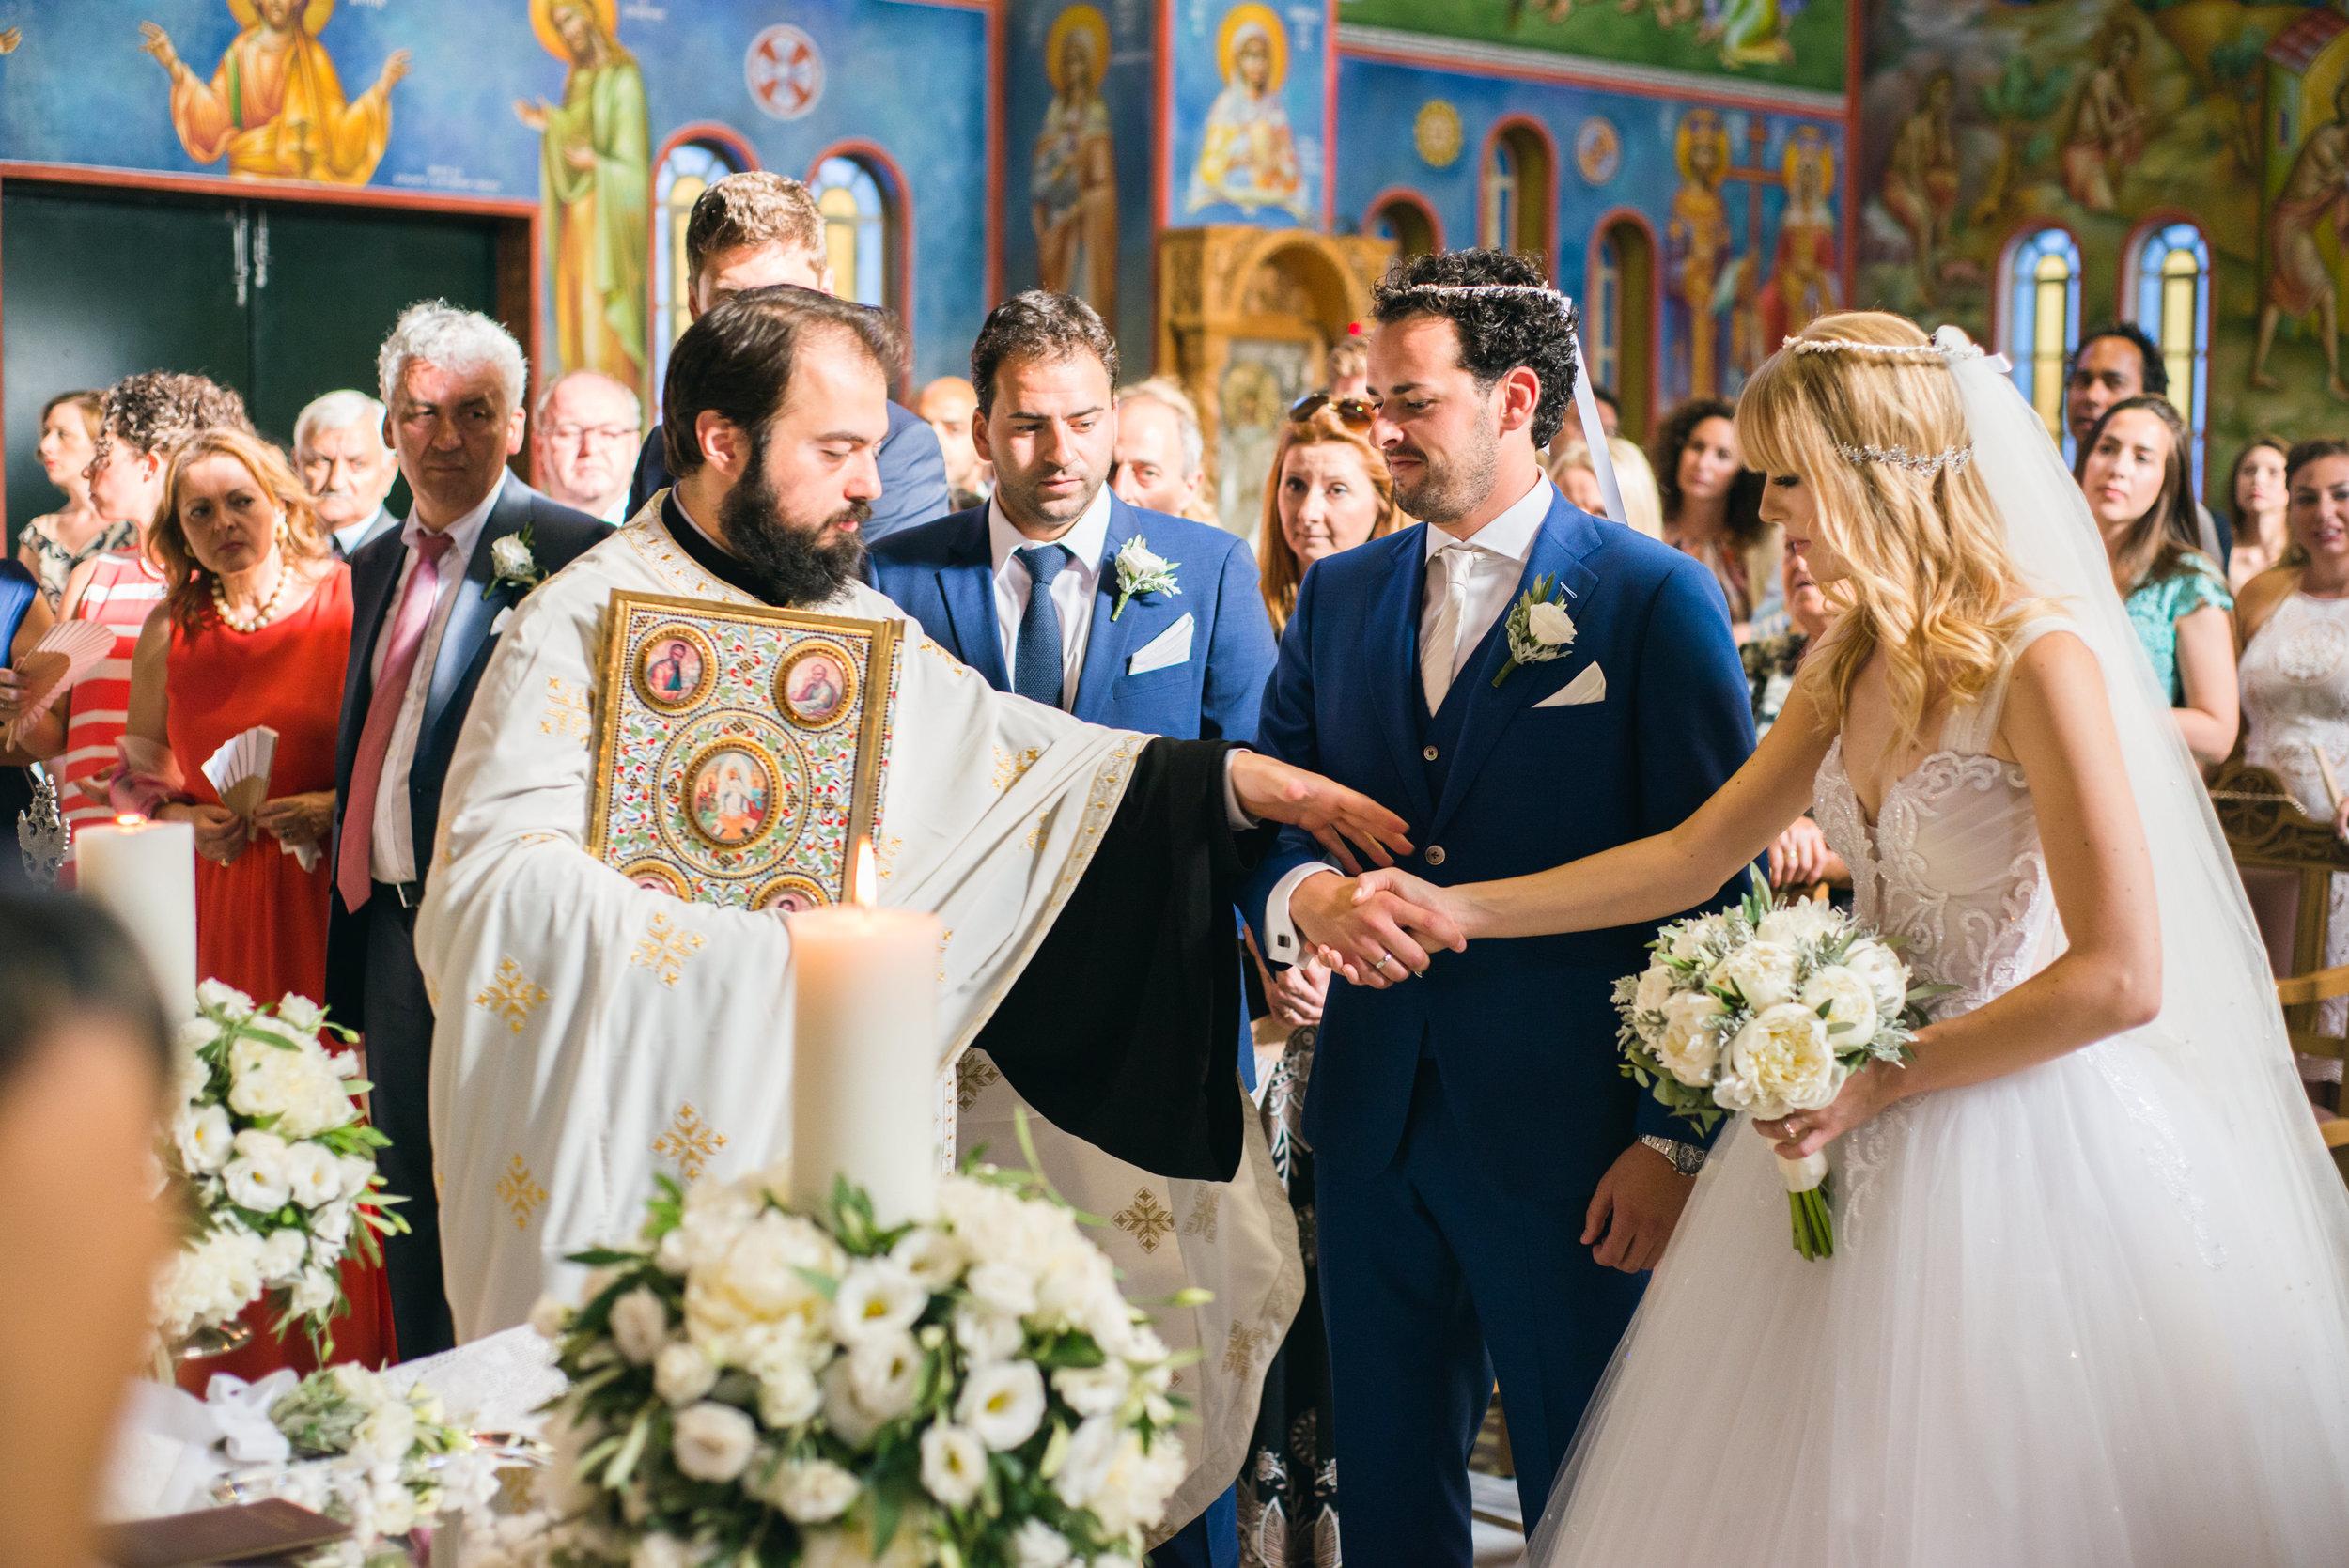 Wedtime_Stories_-_Nikolaos__Stefanie_-_Ceremony-184.jpg